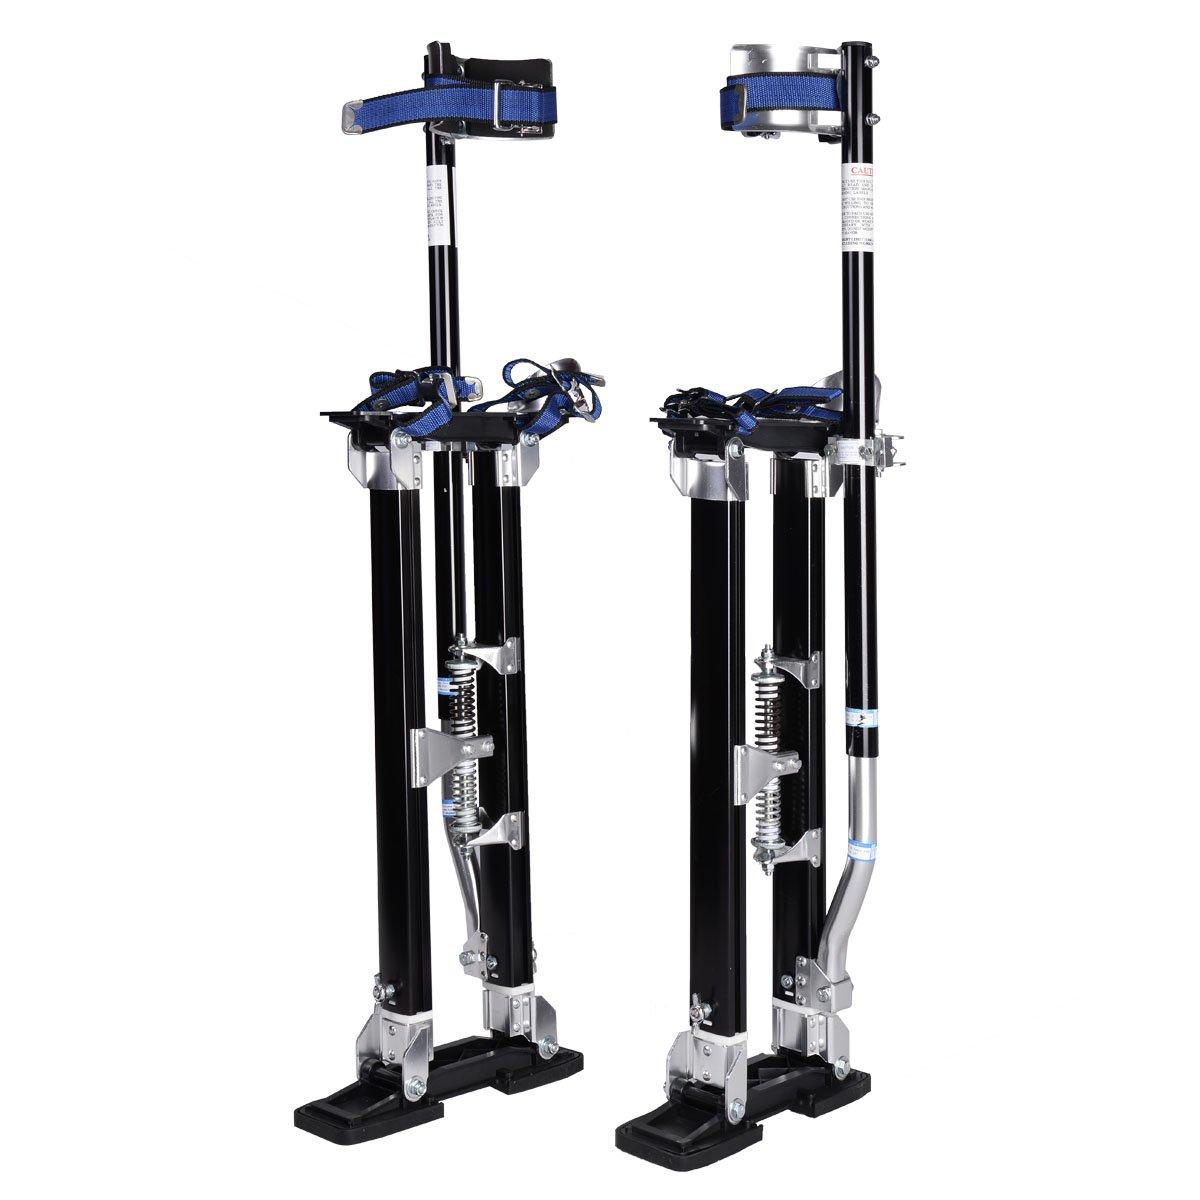 Goplus Drywall Stilts Drywall Lifts Aluminum Tool Stilt for Painting Painter Taping (24''-40'', Black)